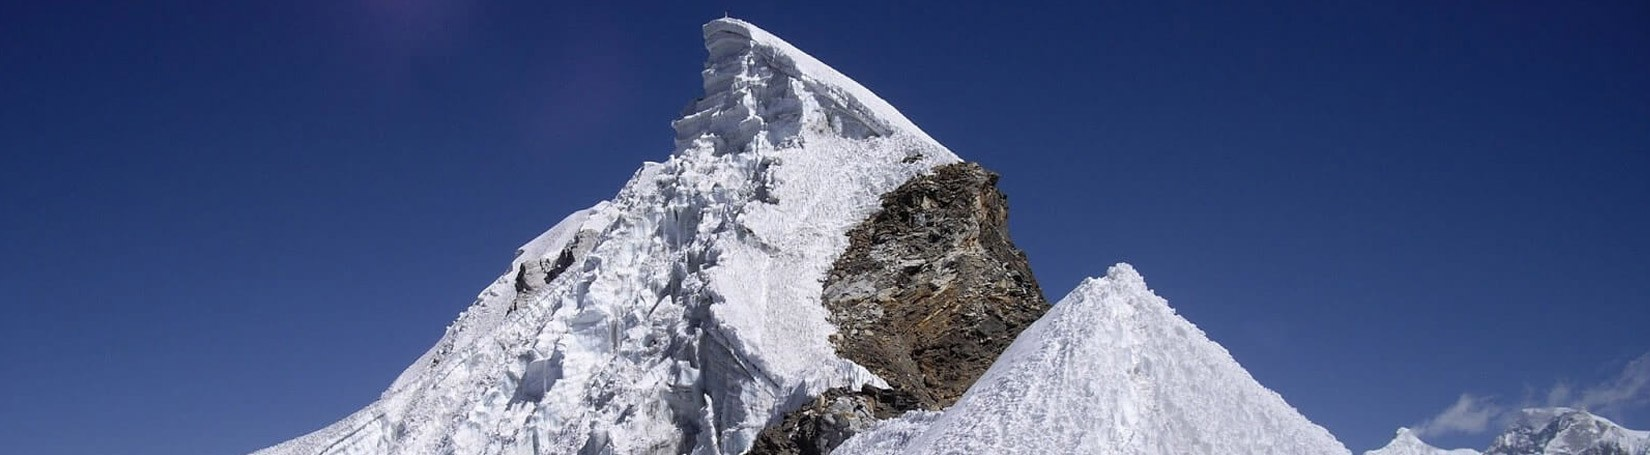 Summit of Lobuche Peak